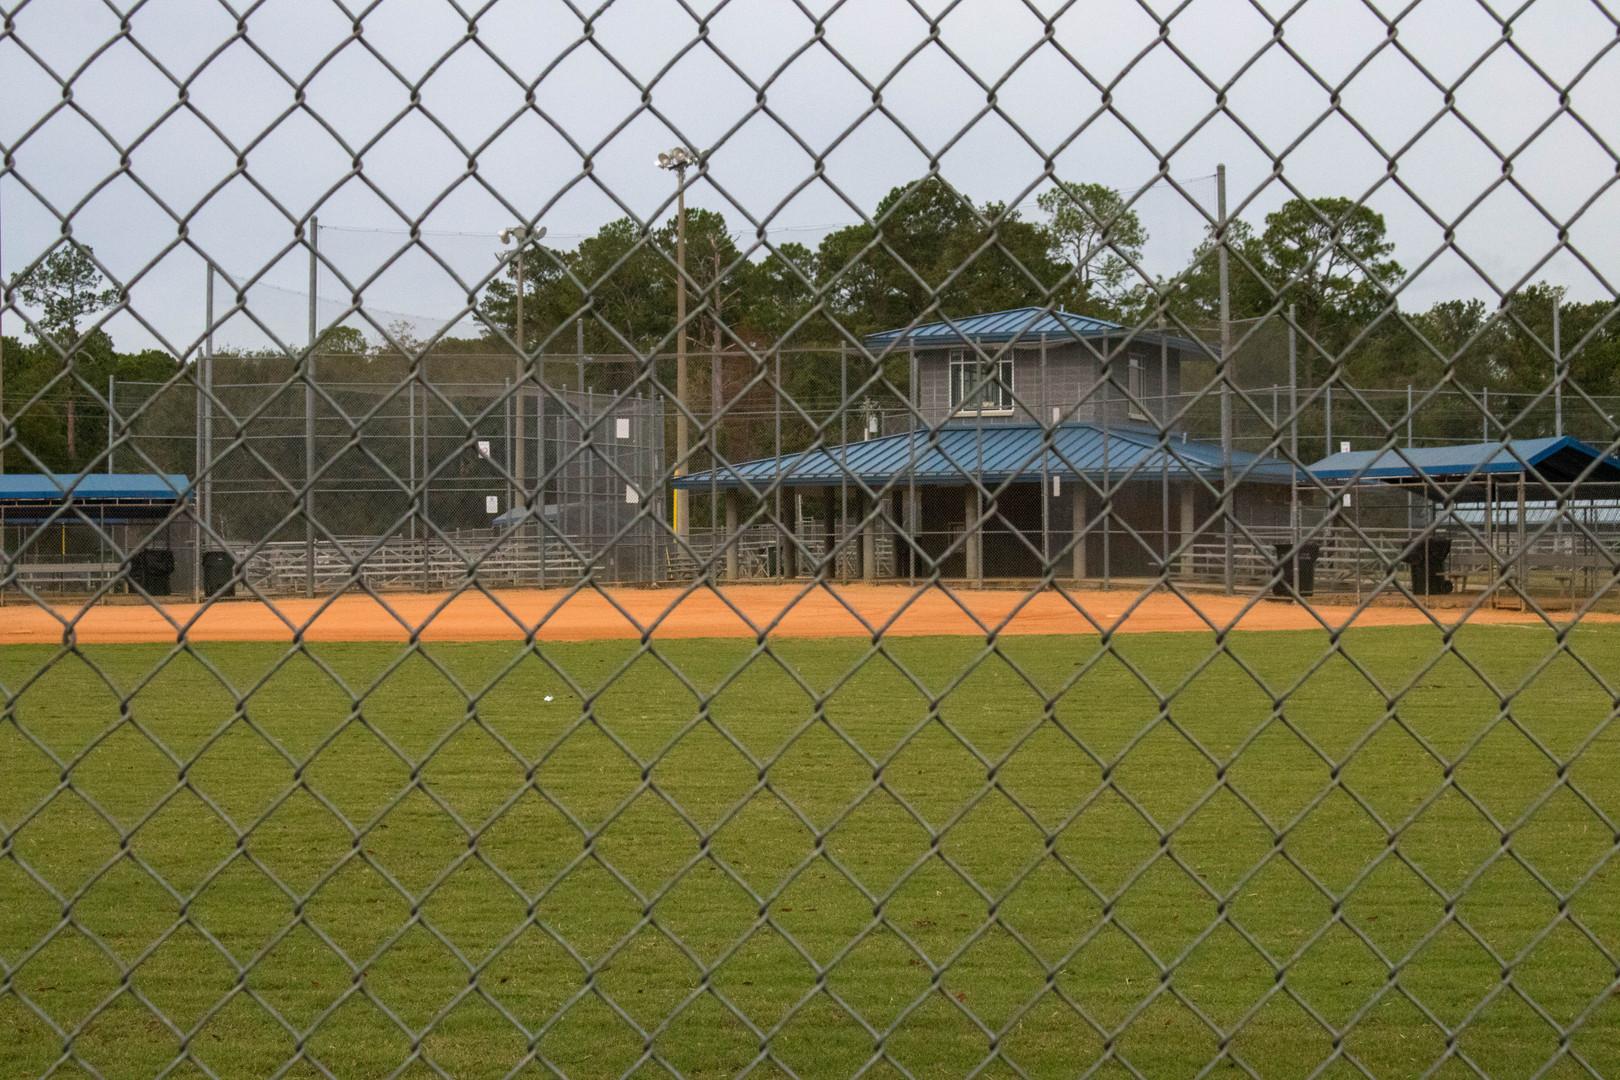 Jim Buck Goff Softball Field